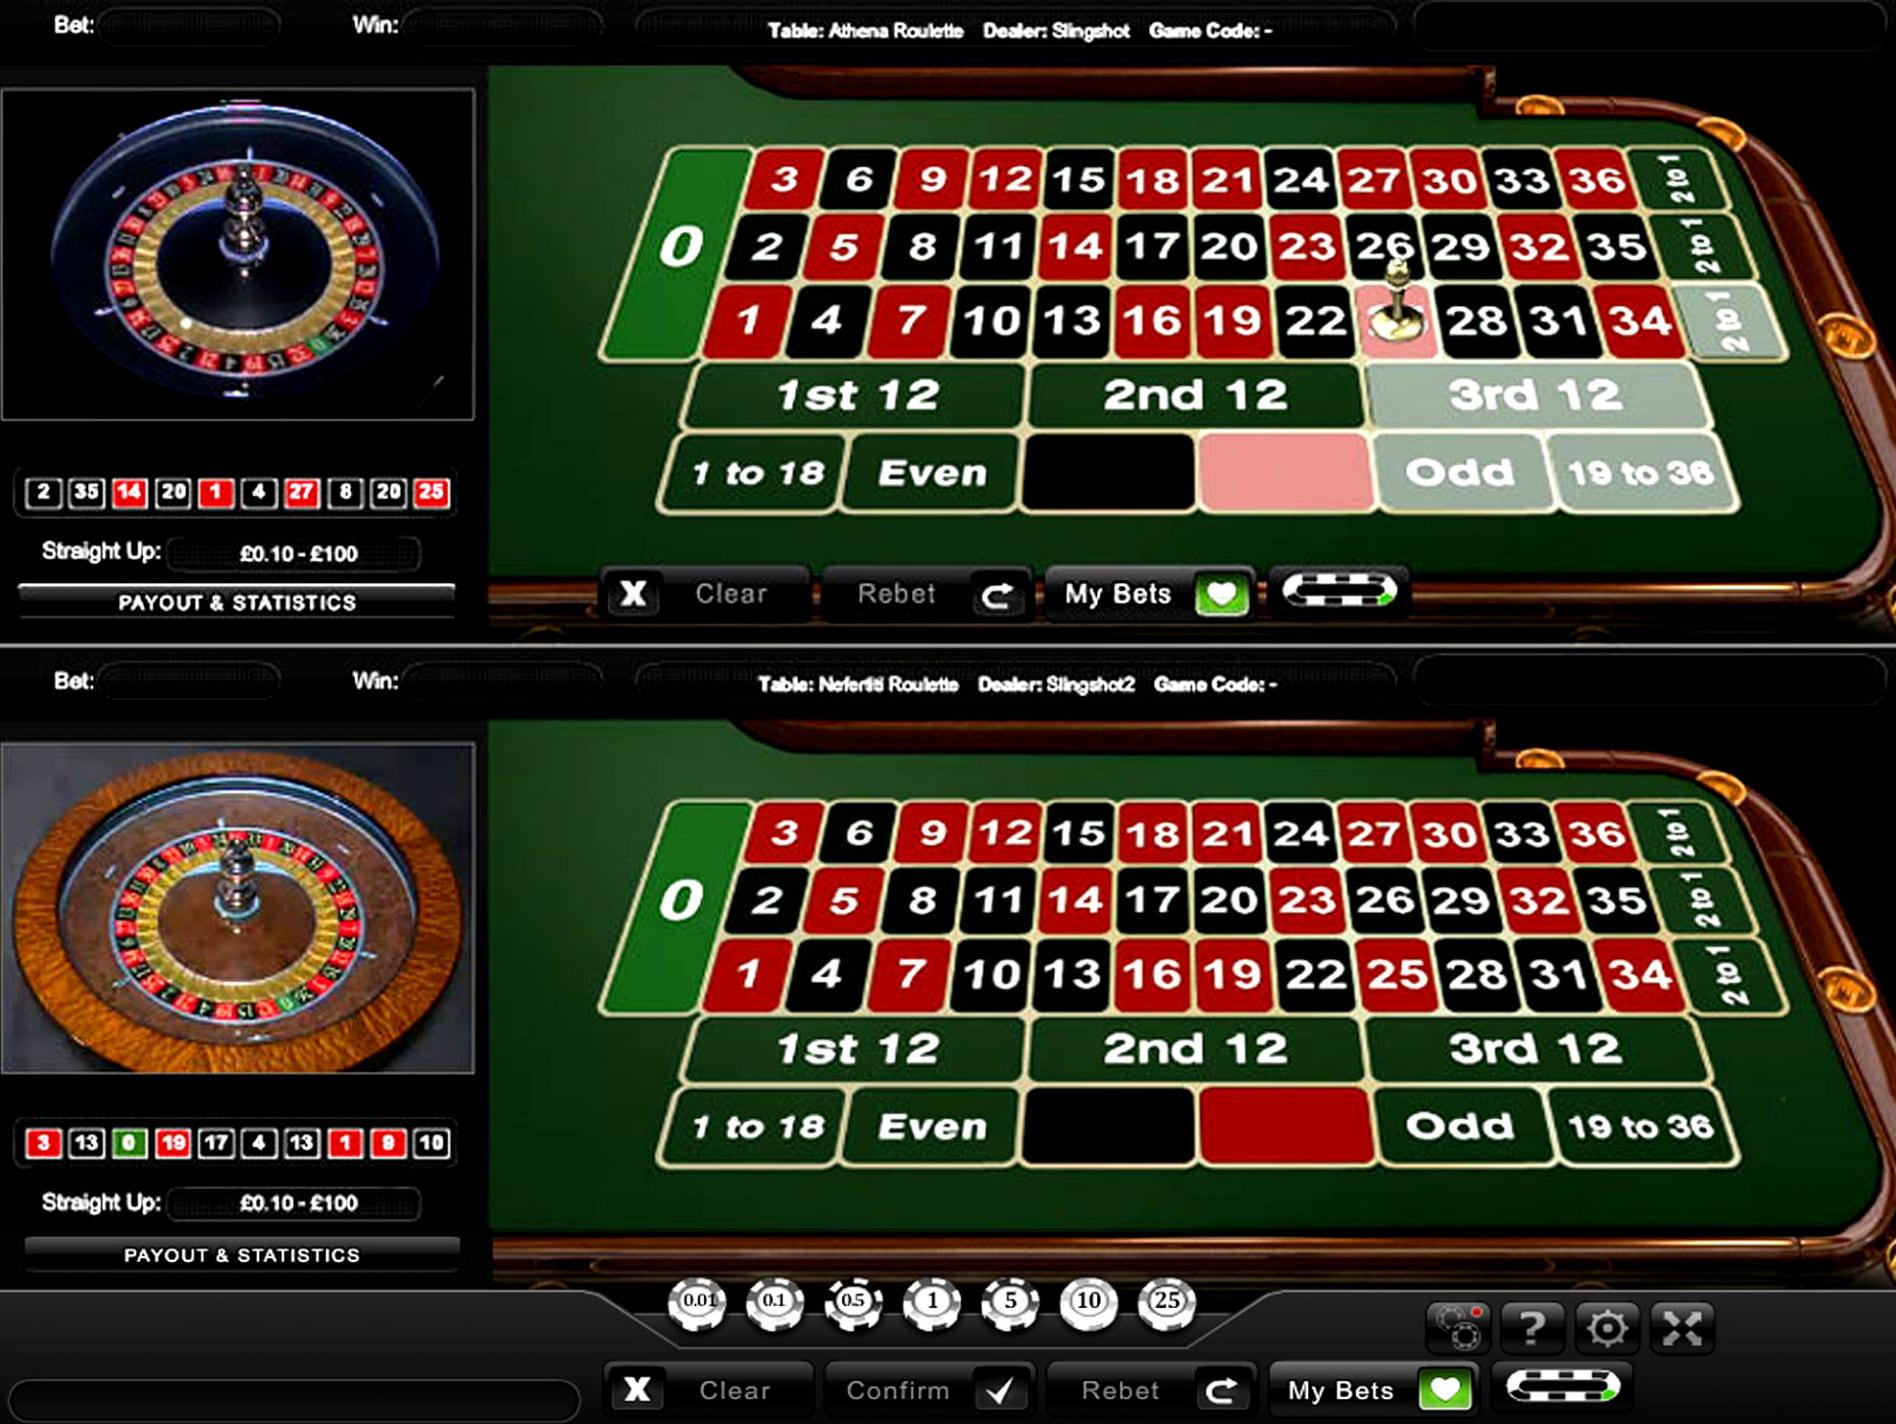 Como jugar a la loteria casino online Porto opiniones - 2403